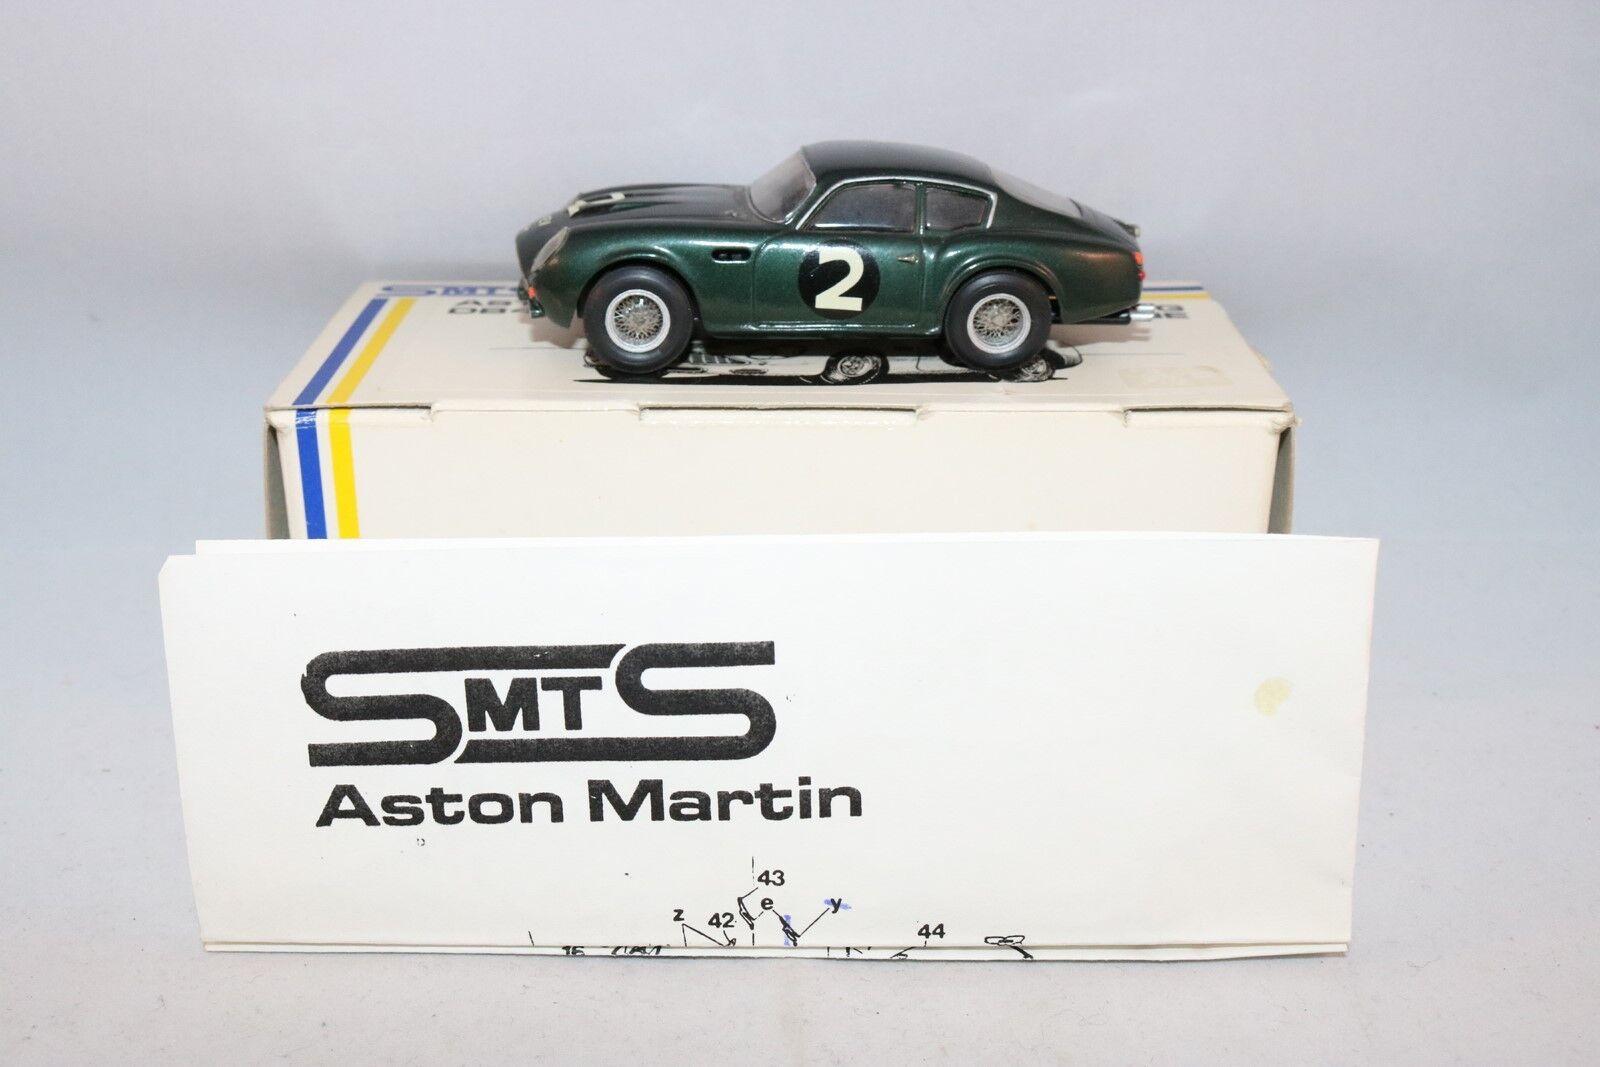 SMTS kit No 5 Aston Martin DB4 GT Zagato 1:43 in 99% mint condition in box